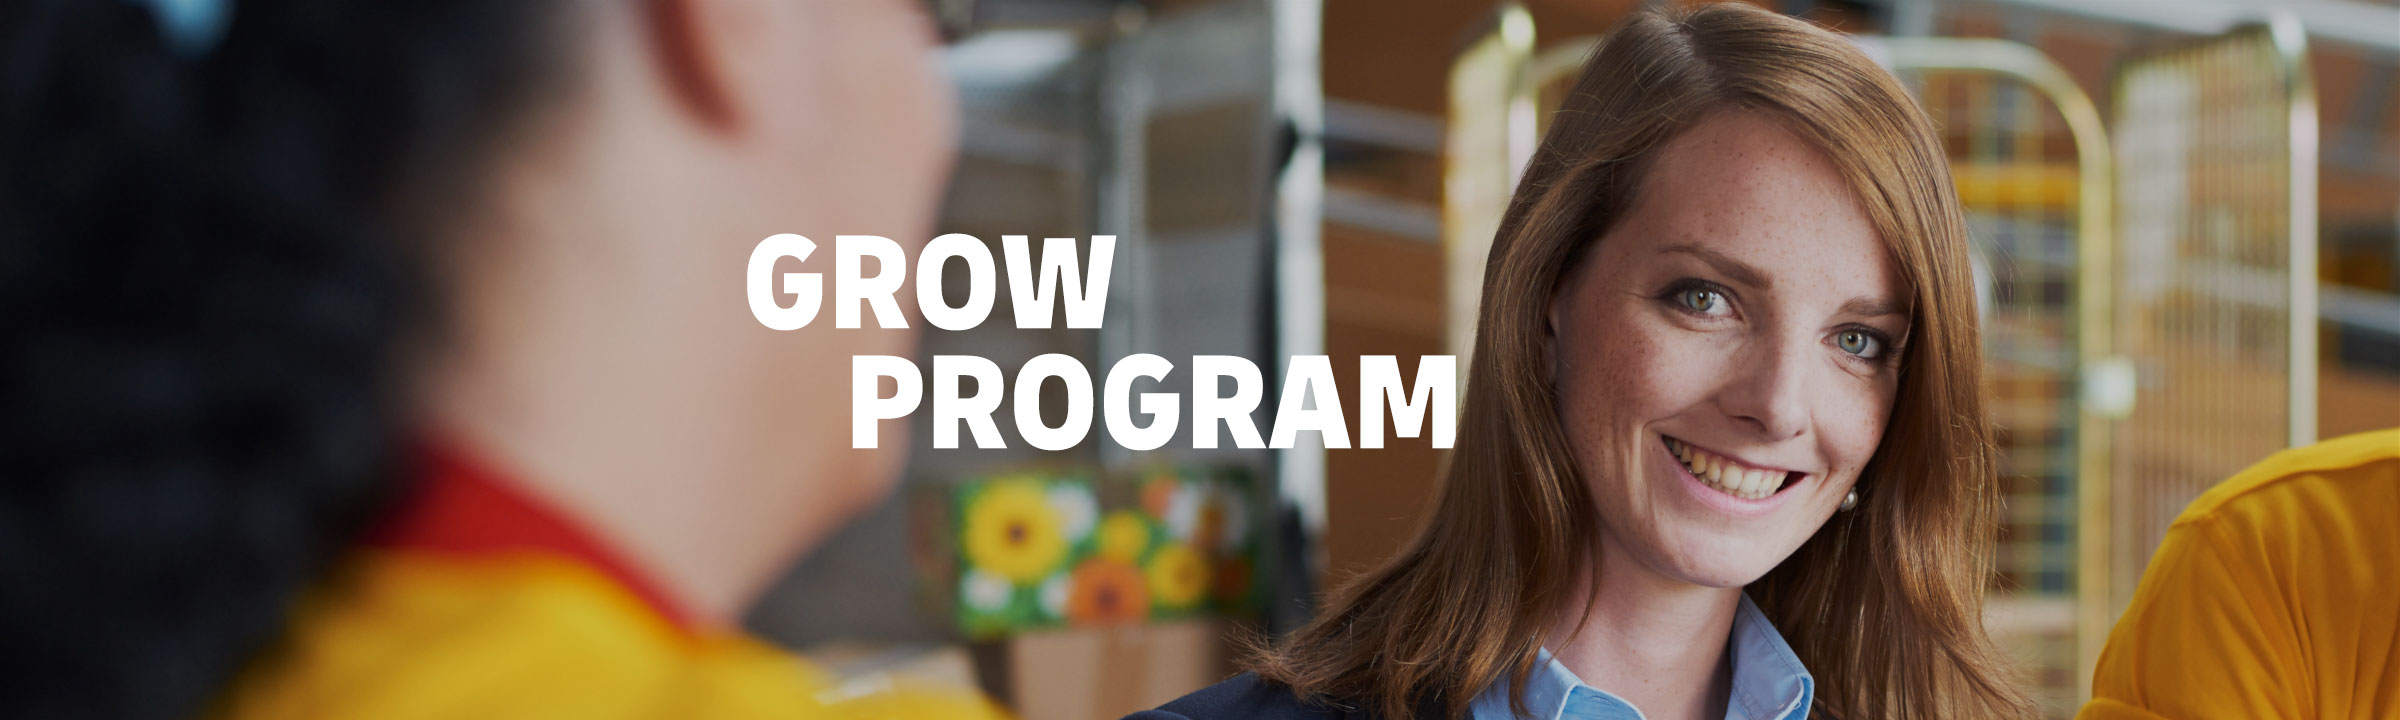 GROW Program